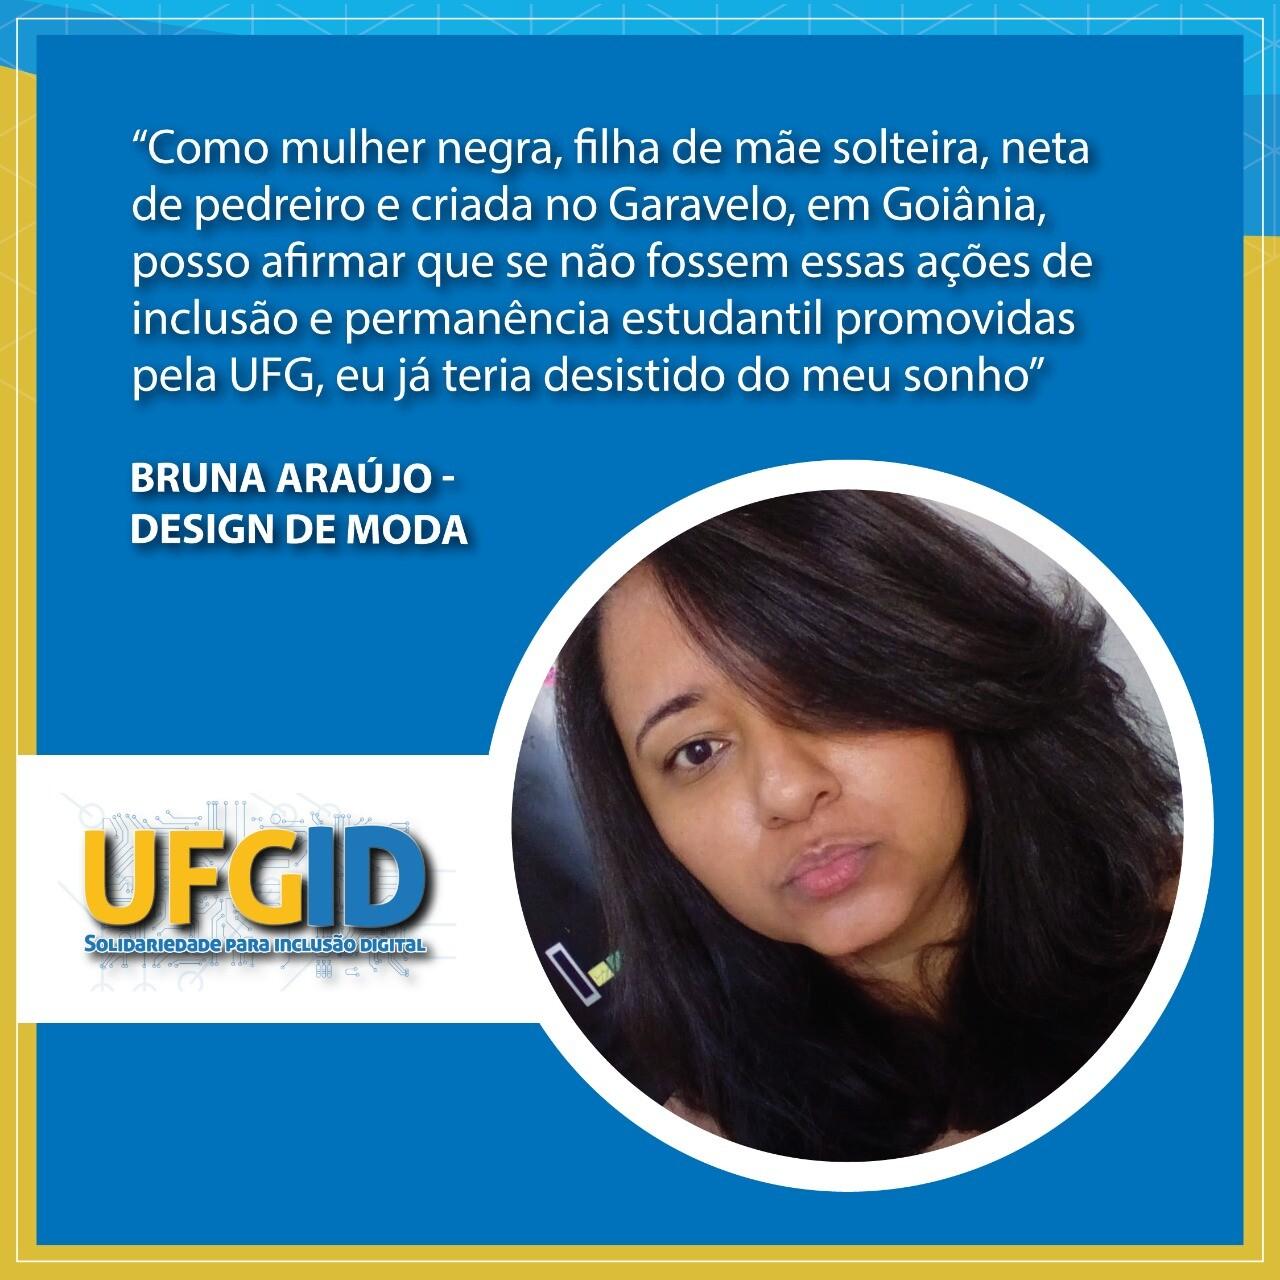 UFGID_02.jpg